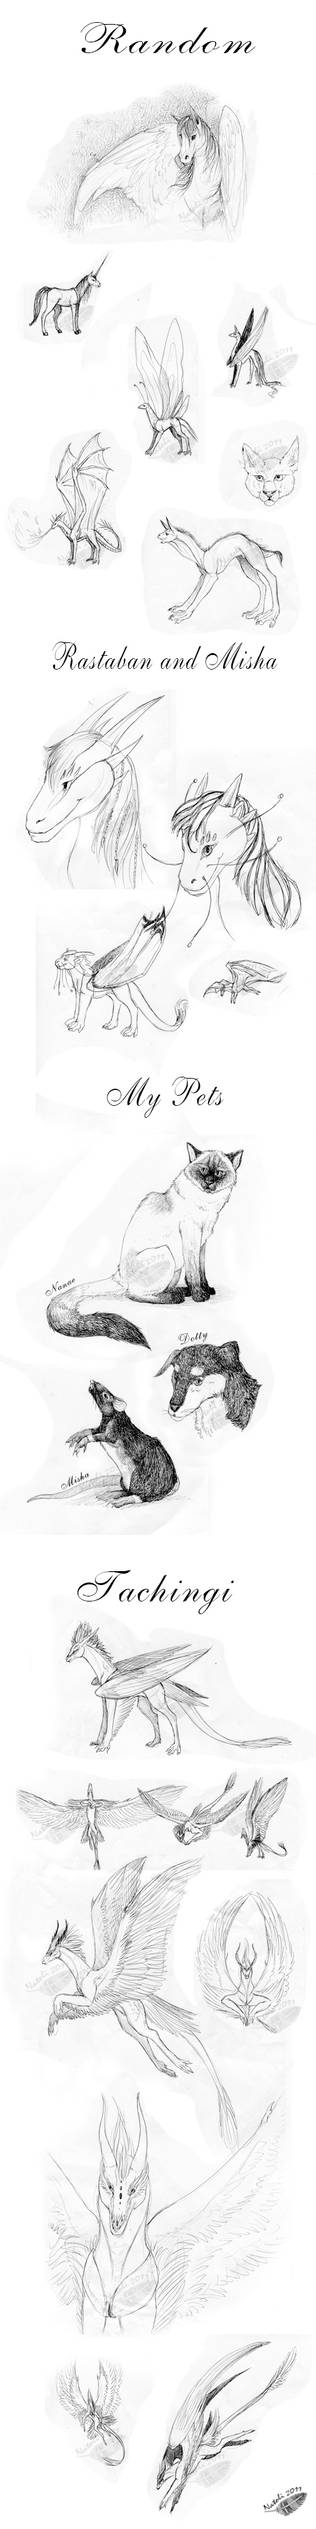 Lectures Doodles